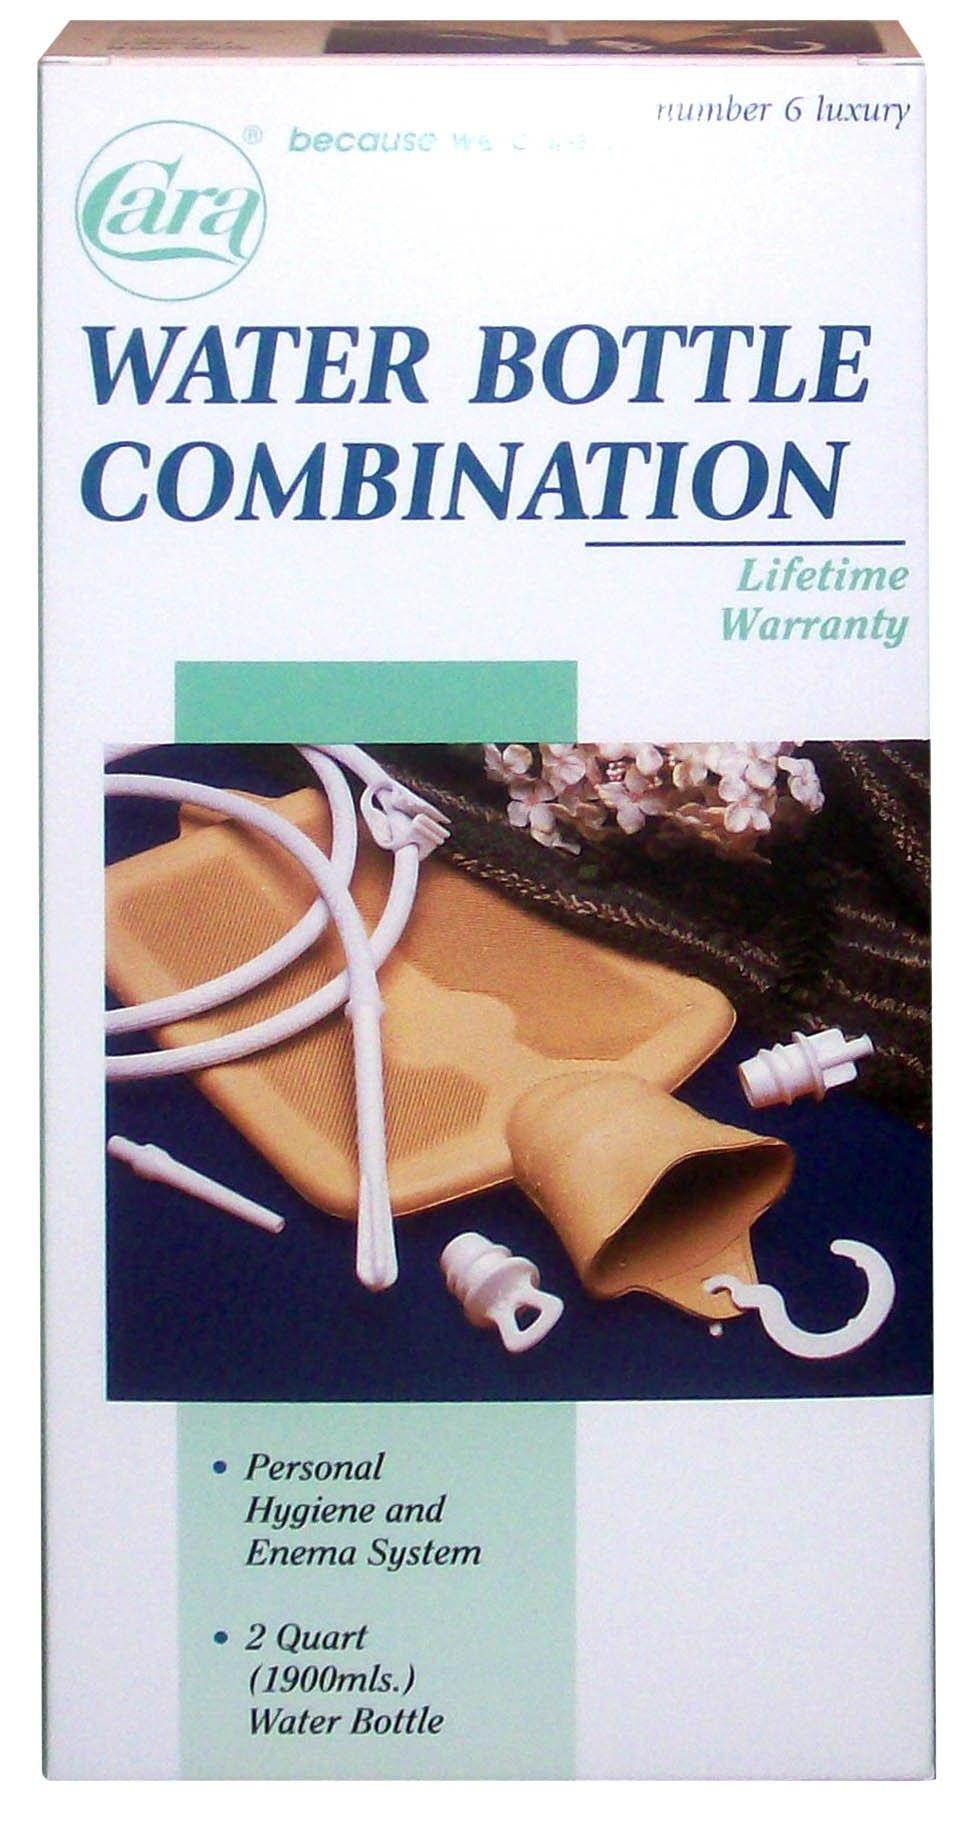 CARA Luxury Douche/Enema Combination Kit